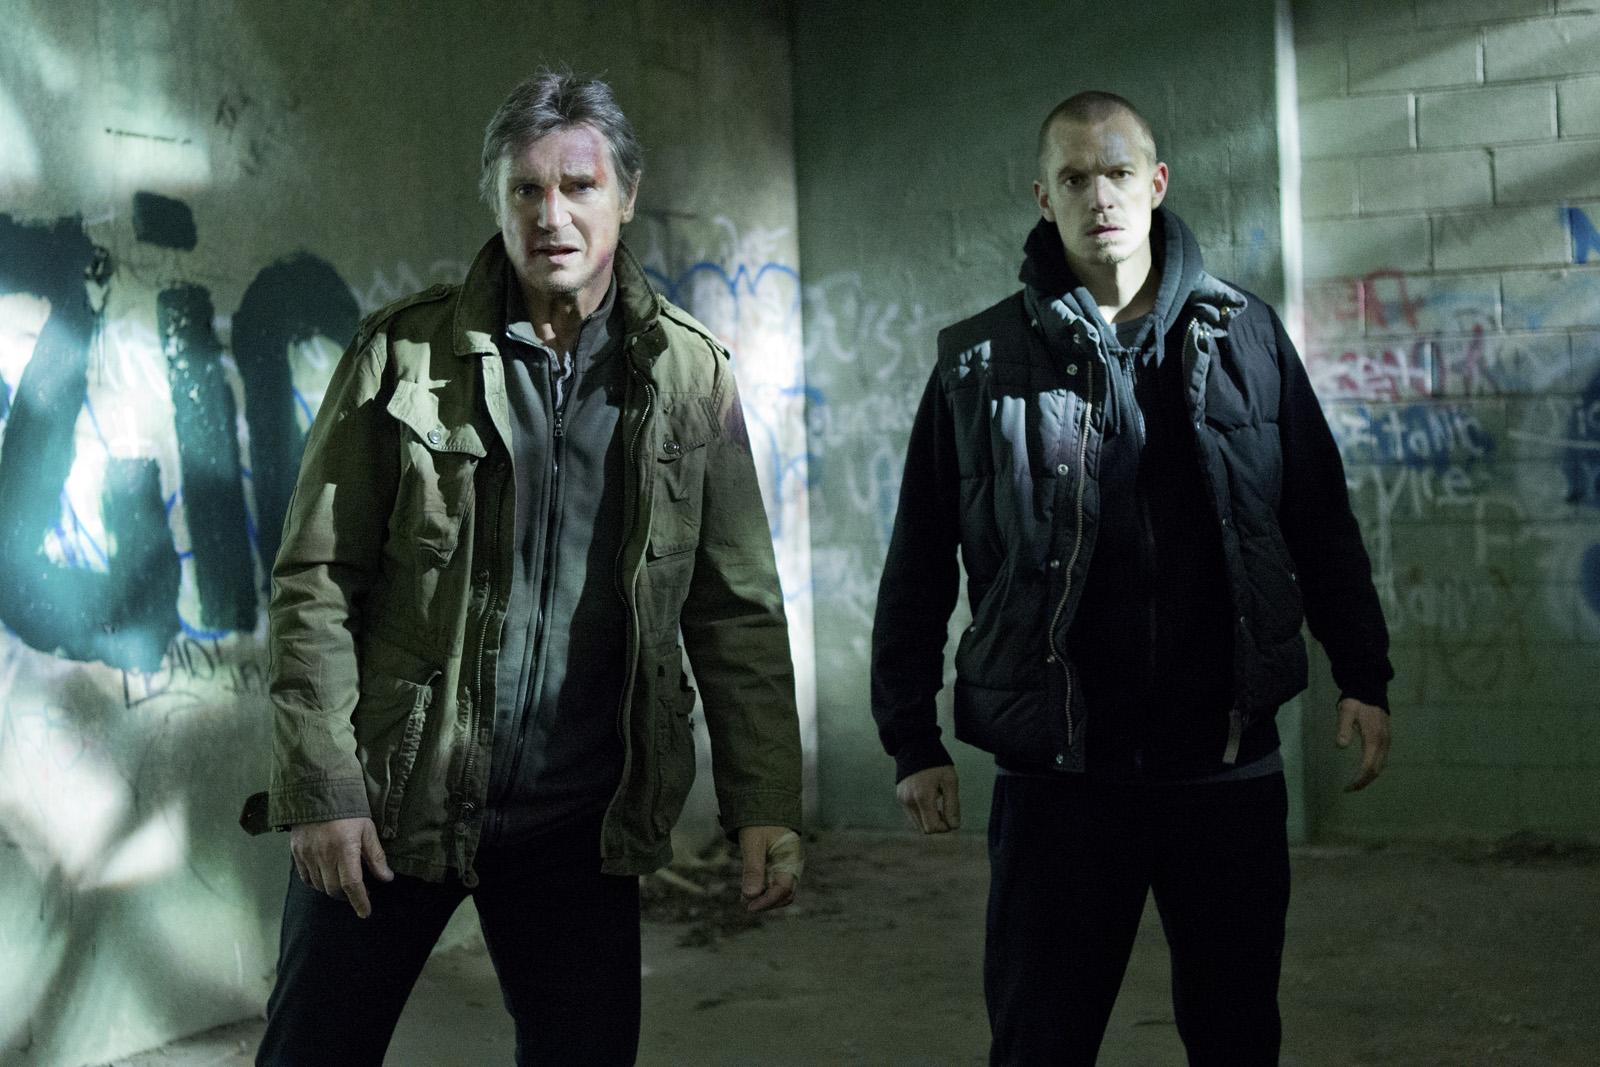 Night Run - Liam Neeson & Joel Kinnaman